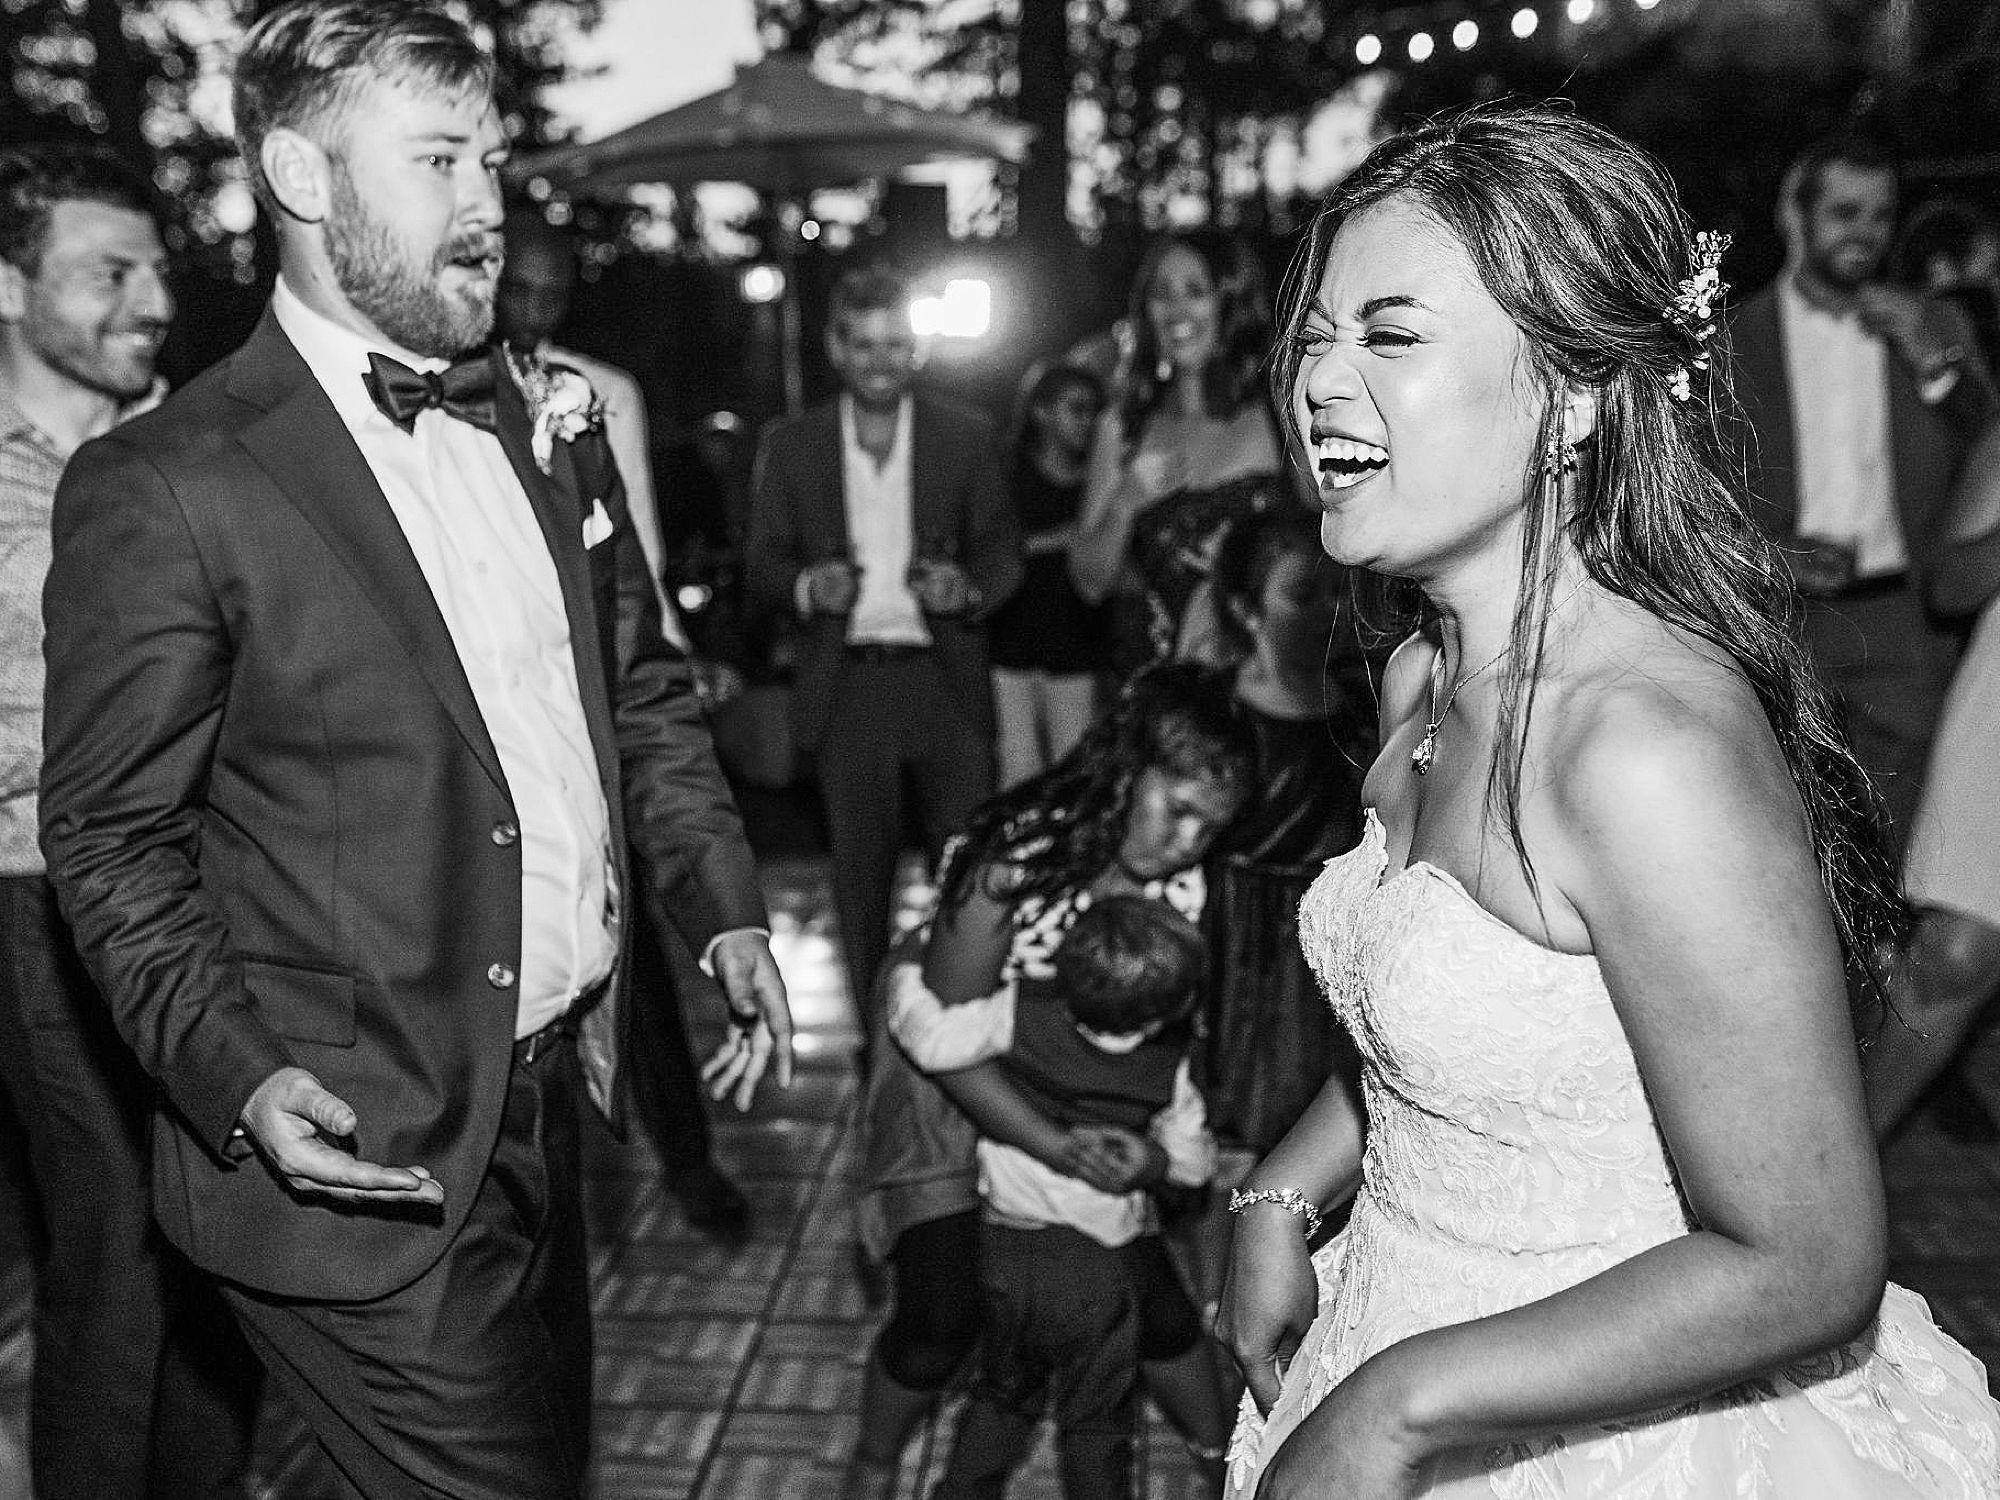 MITCHELLS MOUNTAIN MEADOWS Wedding - Ash Baumgartner - Phallina and Matt - Sierraville Wedding - Tahoe Wedding Photography_0034.jpg